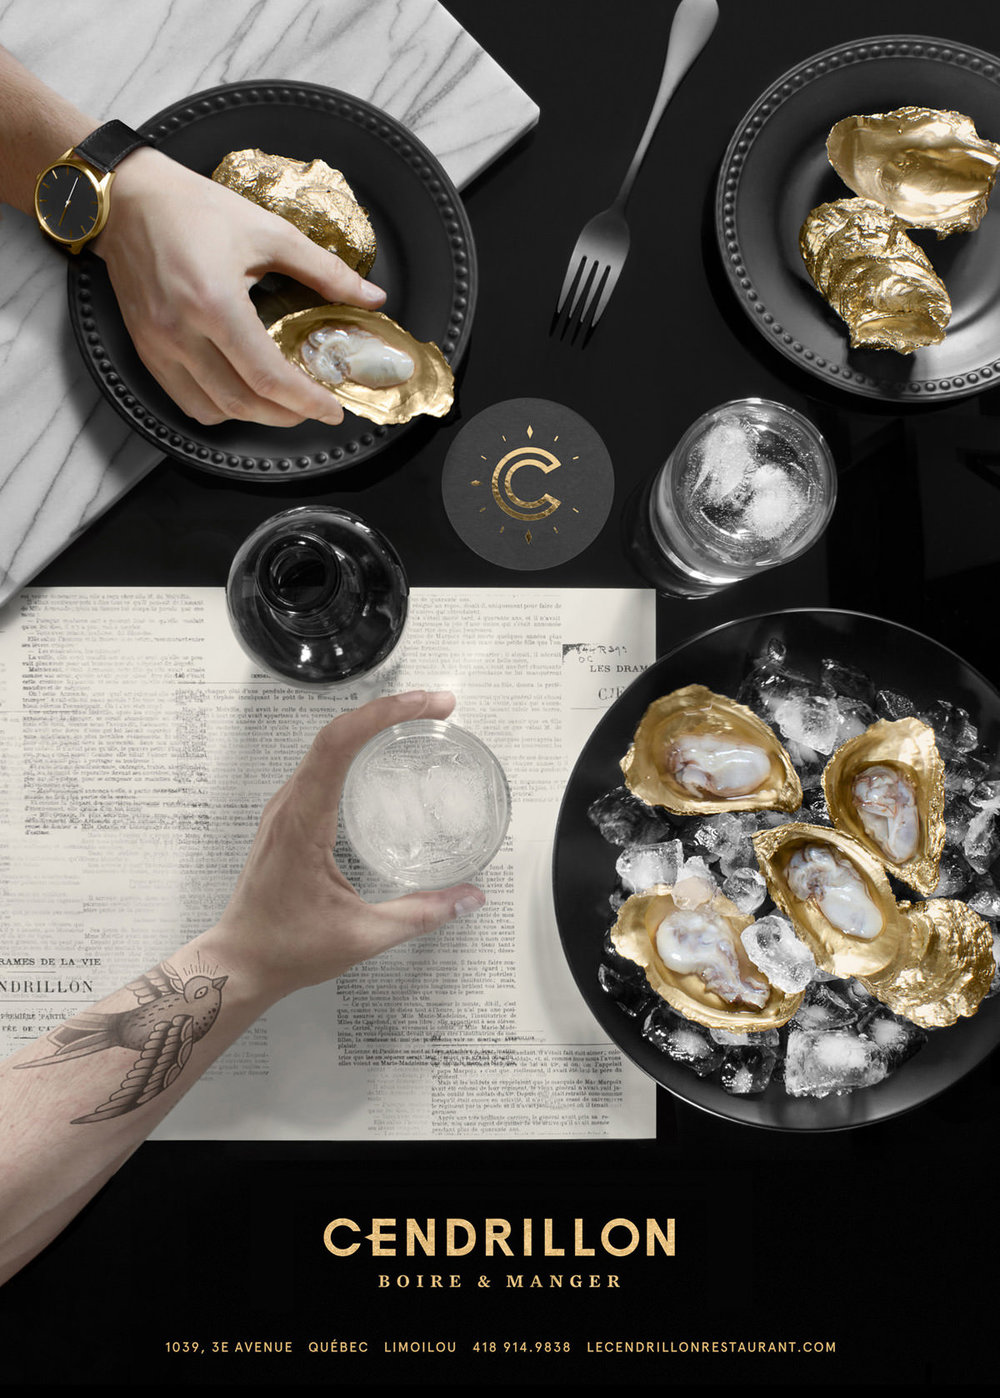 Figure-Cendrillon-Restaurant-Publicite-7.jpg